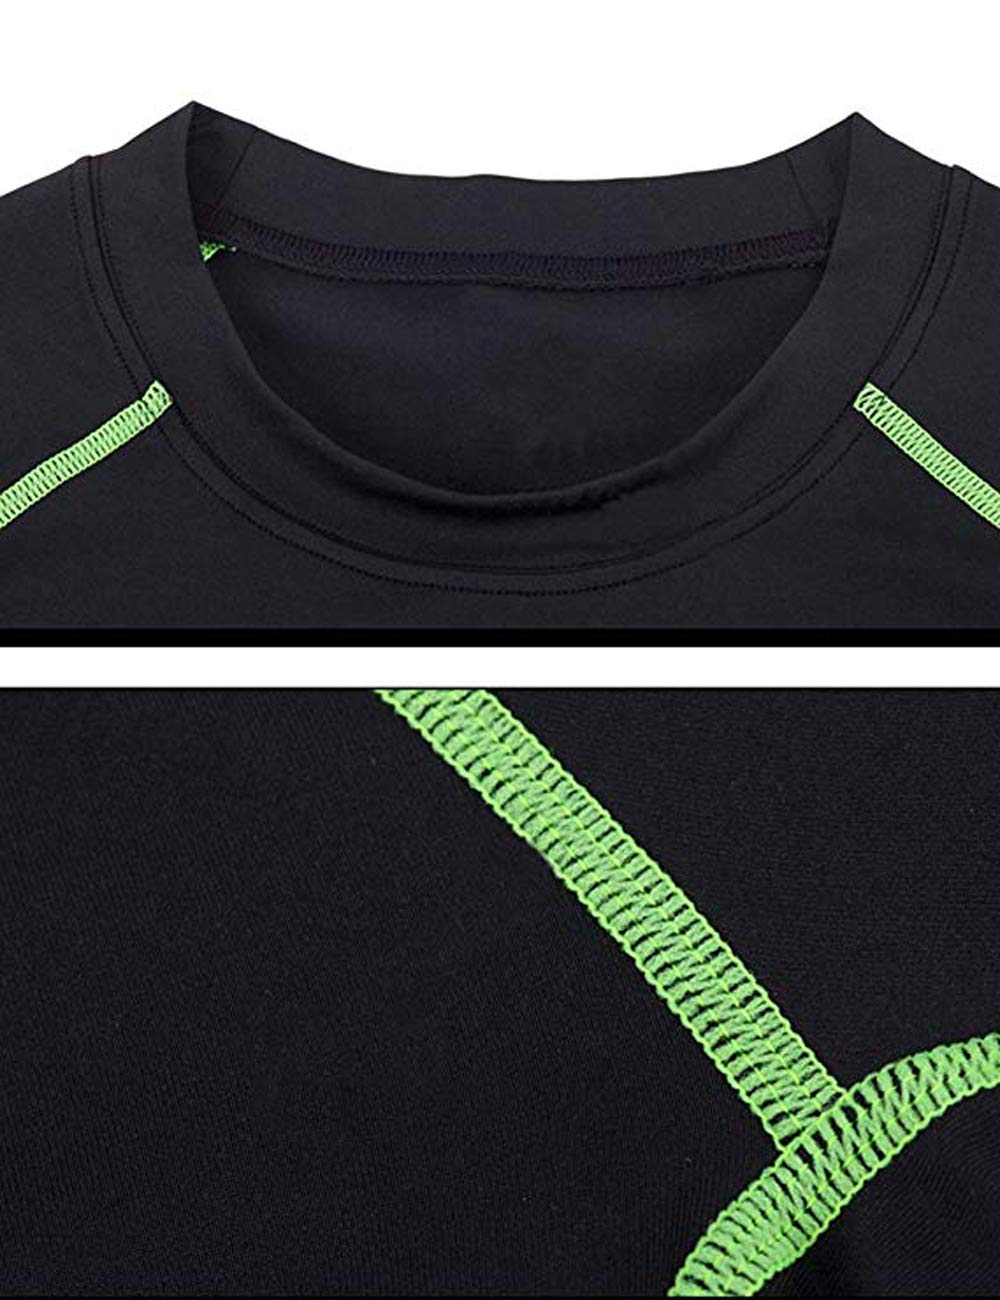 BUYKUD Kids' Boys Long Sleeve Base Layer Compression Underwear Athletic Shirt Tights Top & Bottom Set 4